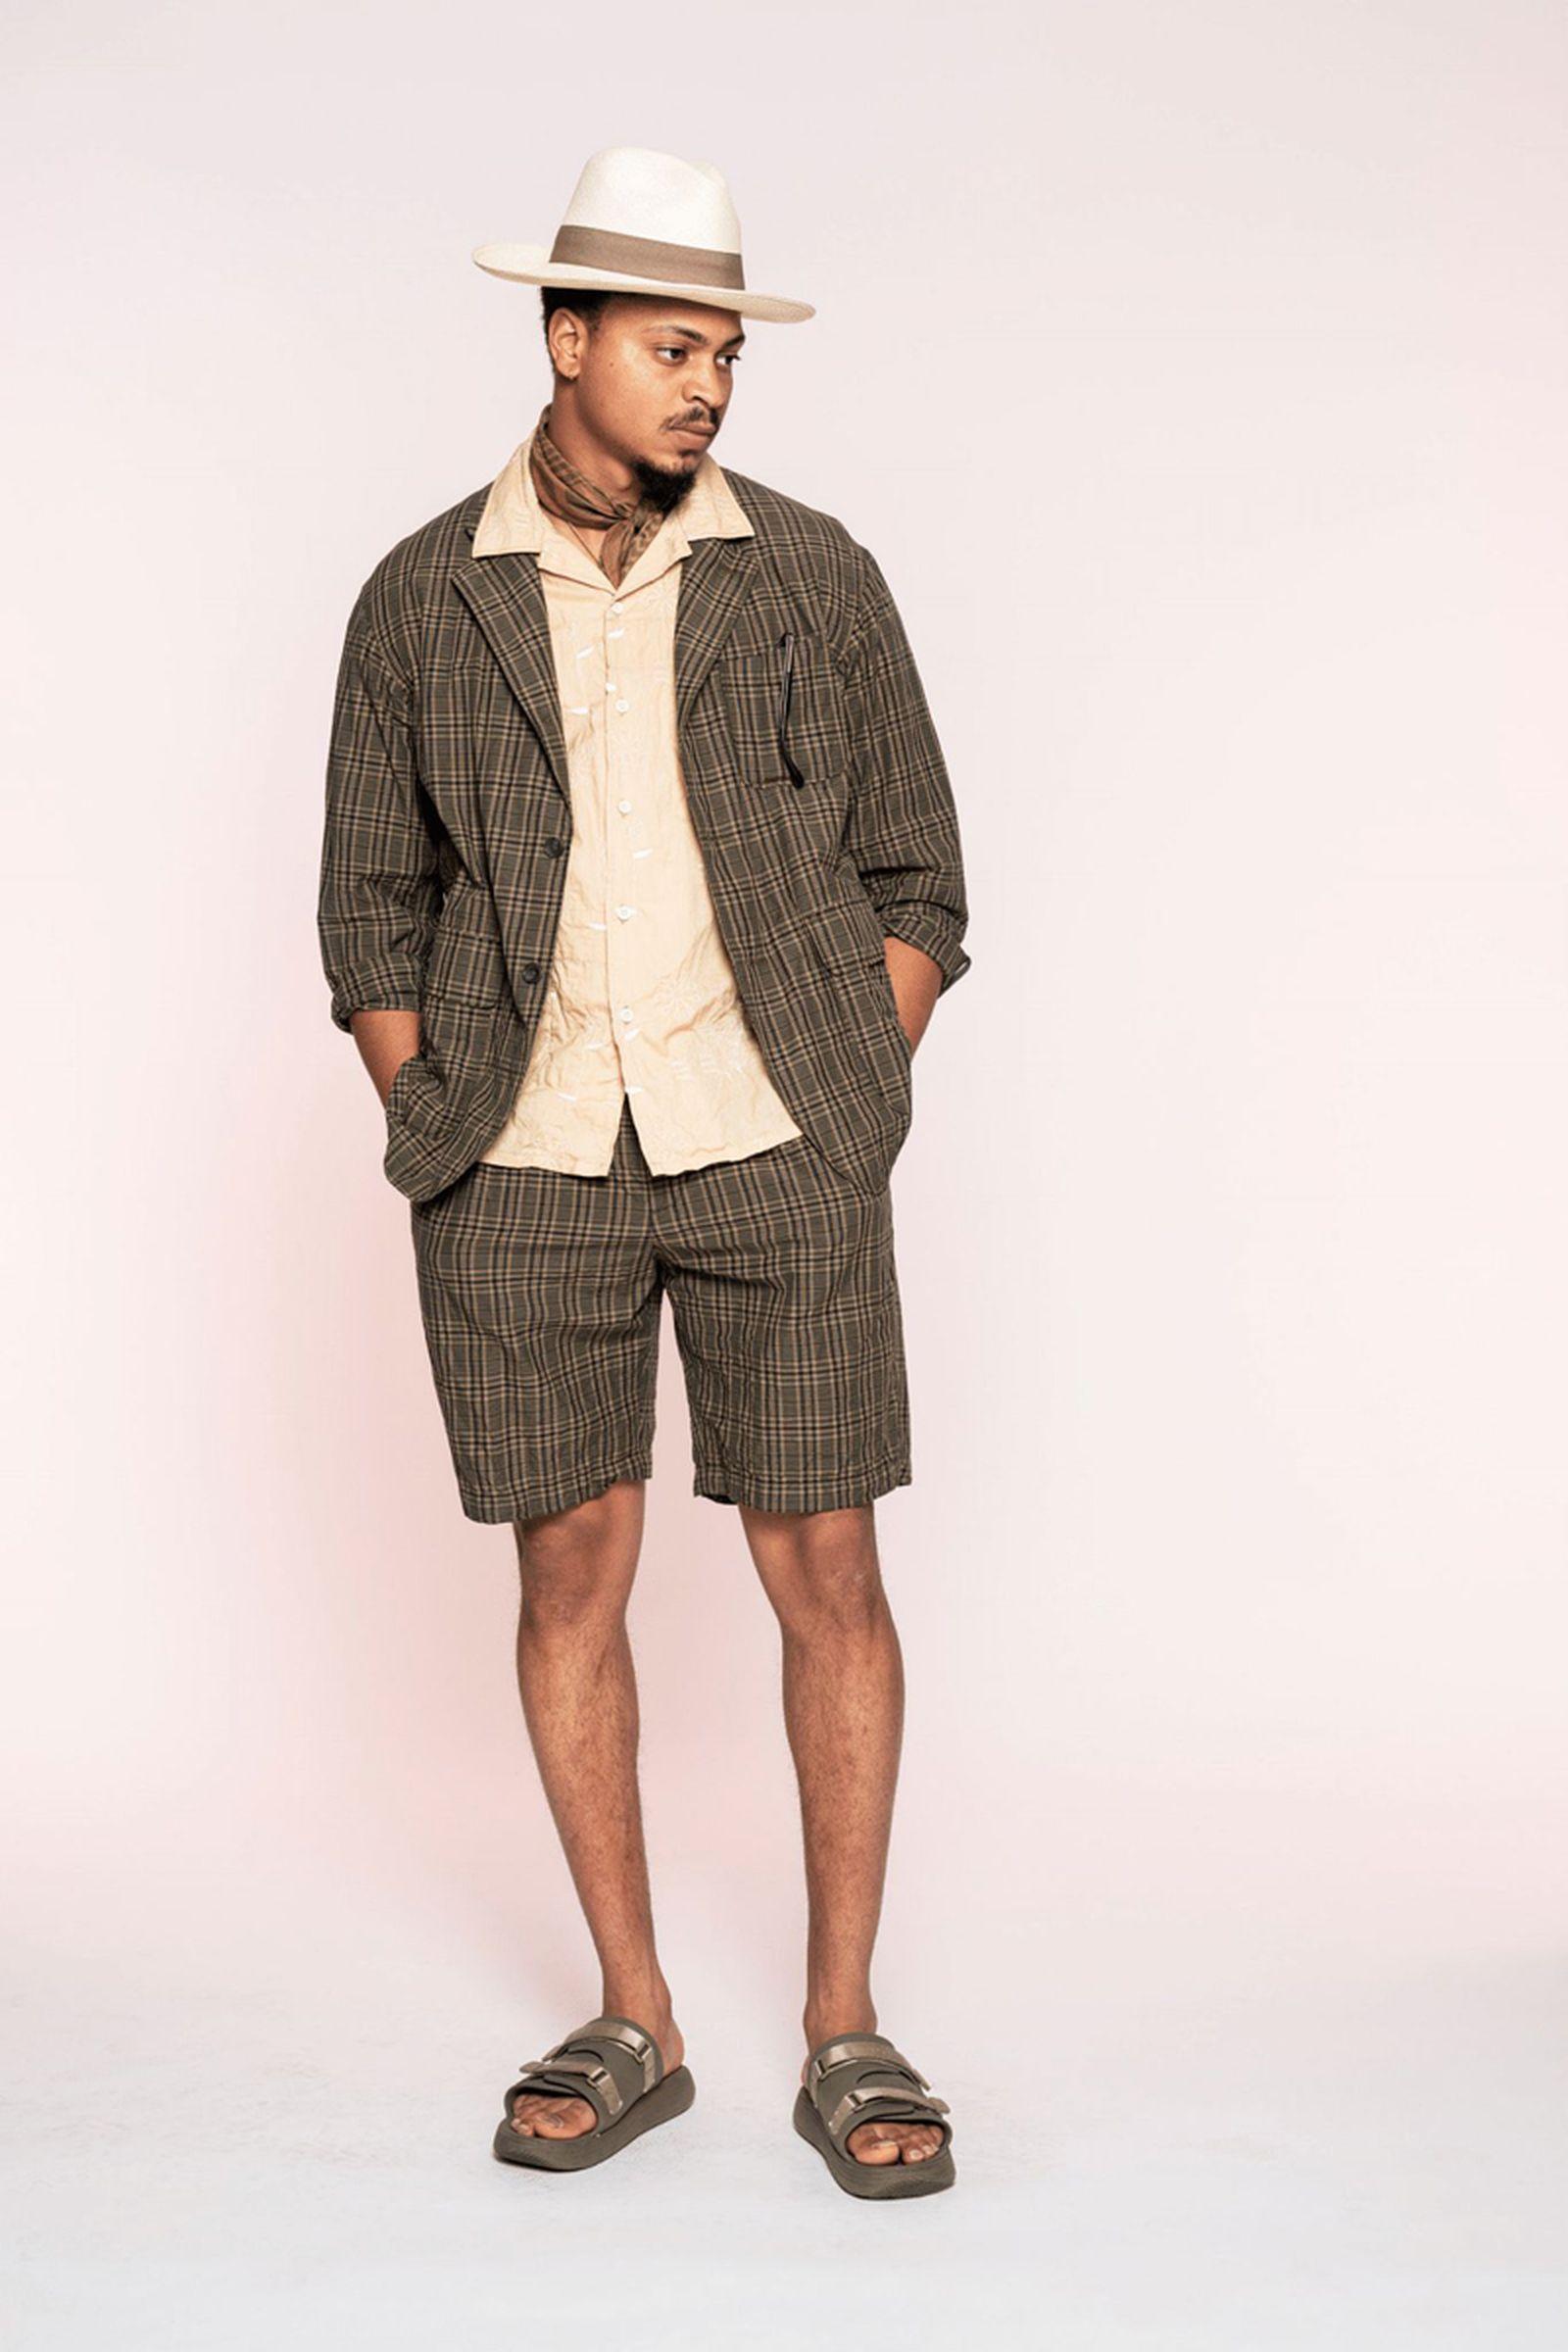 engineered garments spring summer 2022 collection lookbook (5)